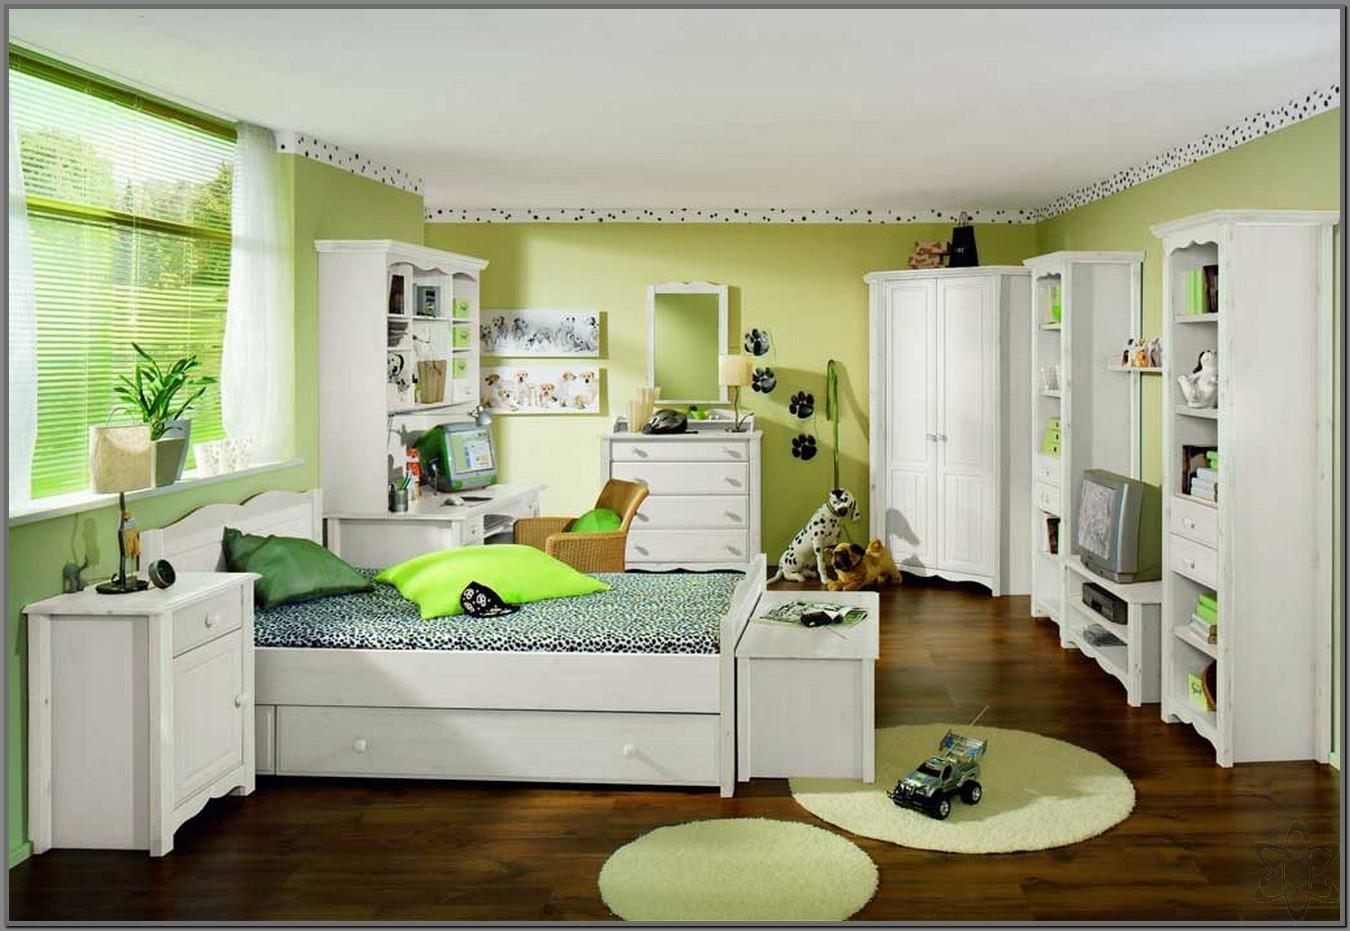 60 desain kamar tidur warna hijau minimalis, modern, simpel, dan